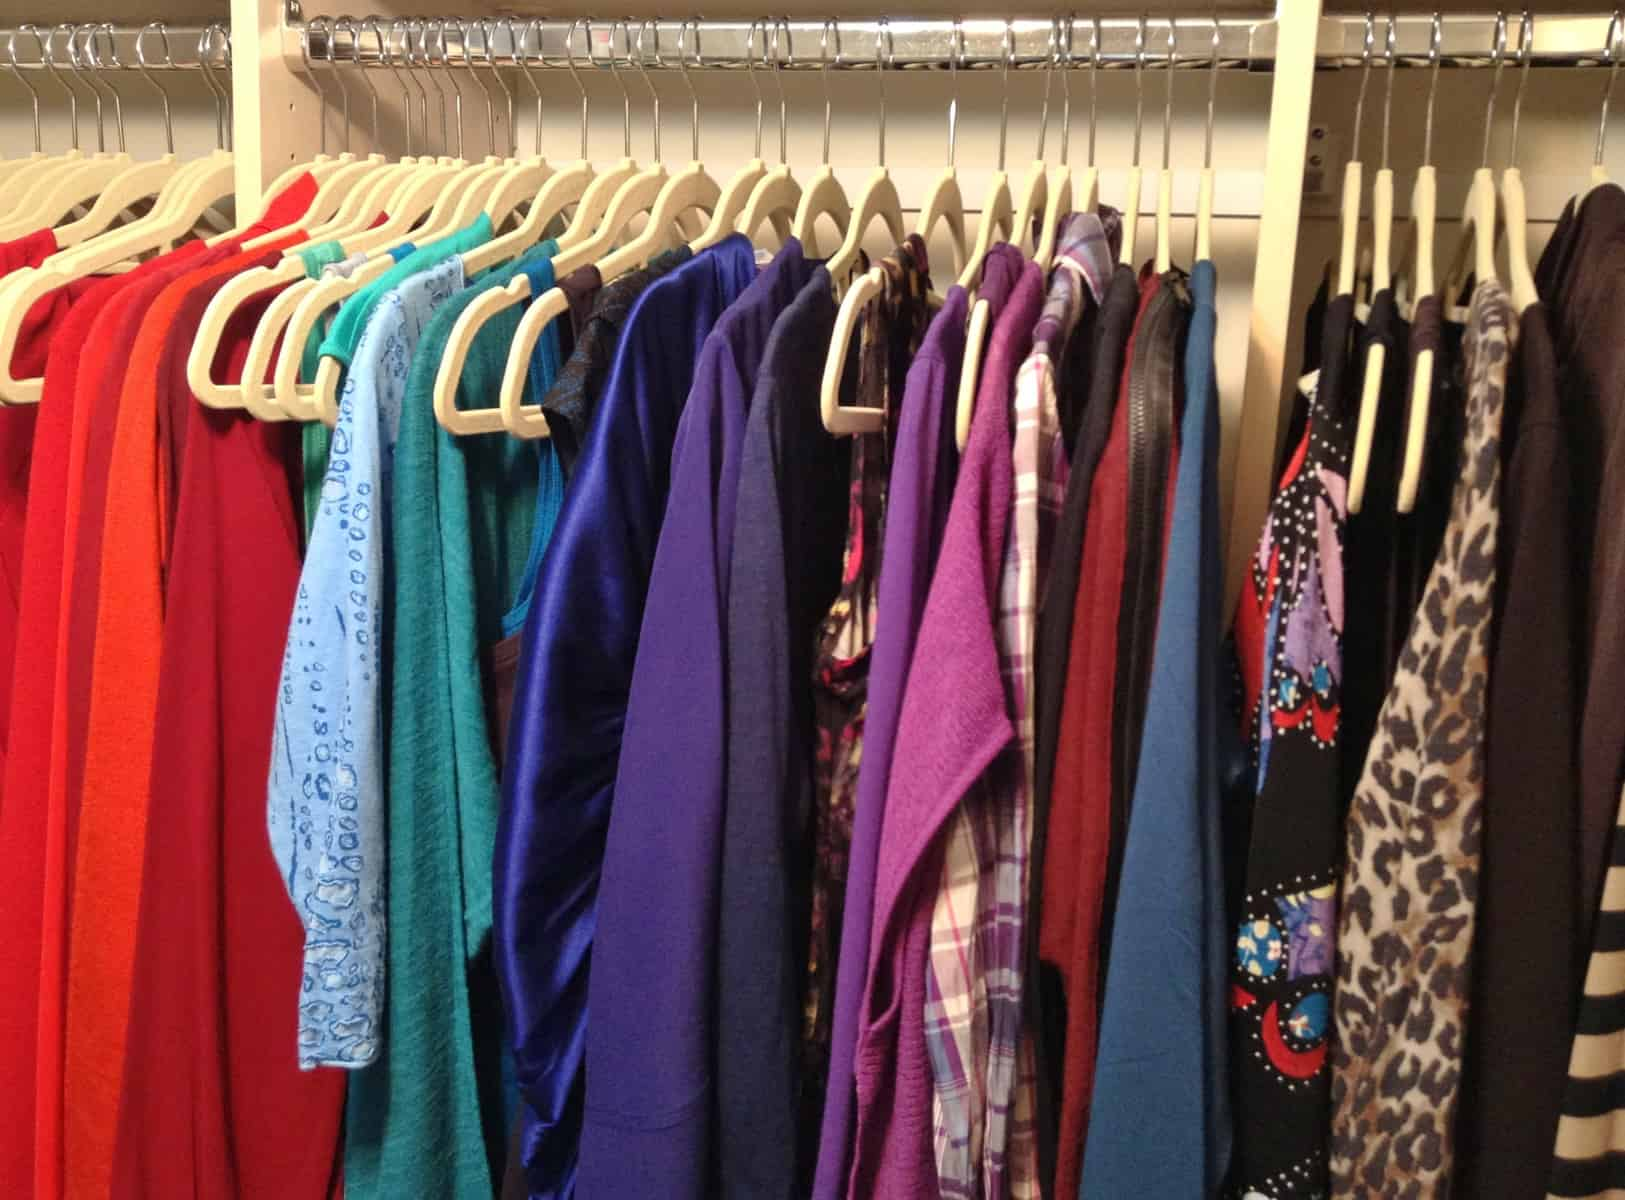 Organizing Closets: How I Became a Hanger Snob (and You ...